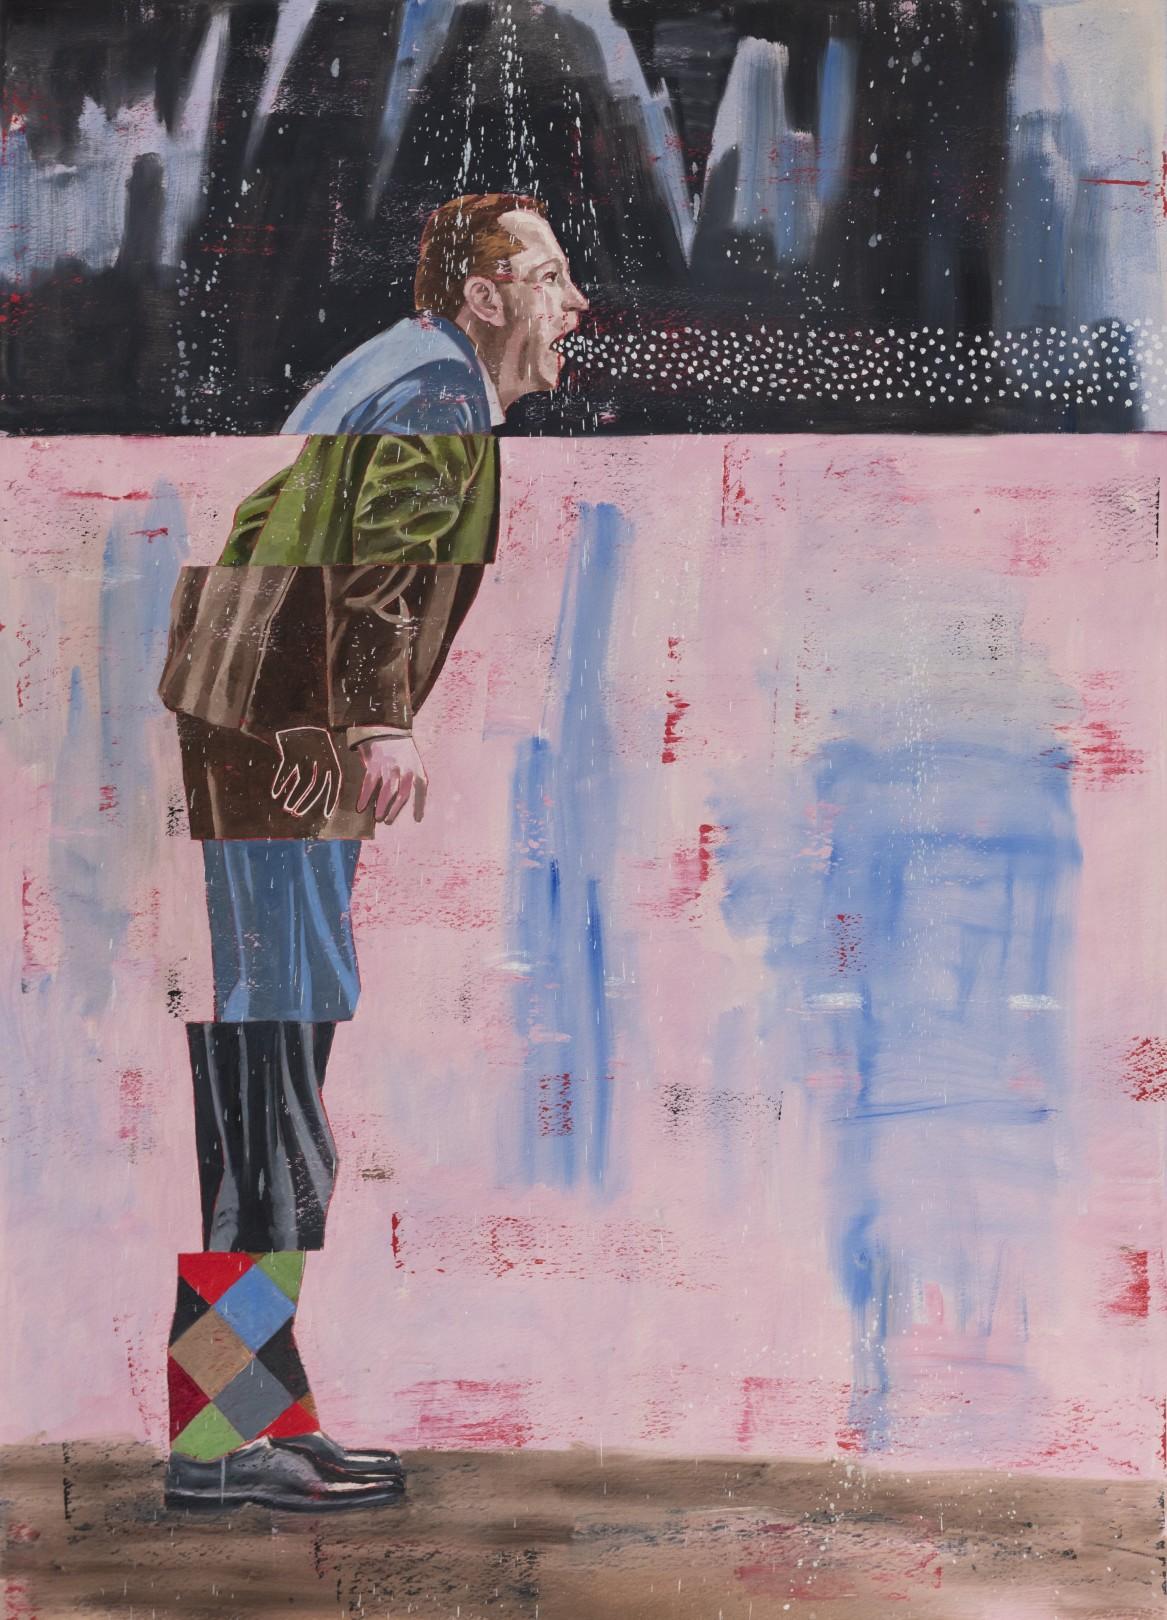 Nicky Nodjoumi Gently Talk to Me, 2019 Oil on canvas 183 x 127 cm. / 72 x 50 in.